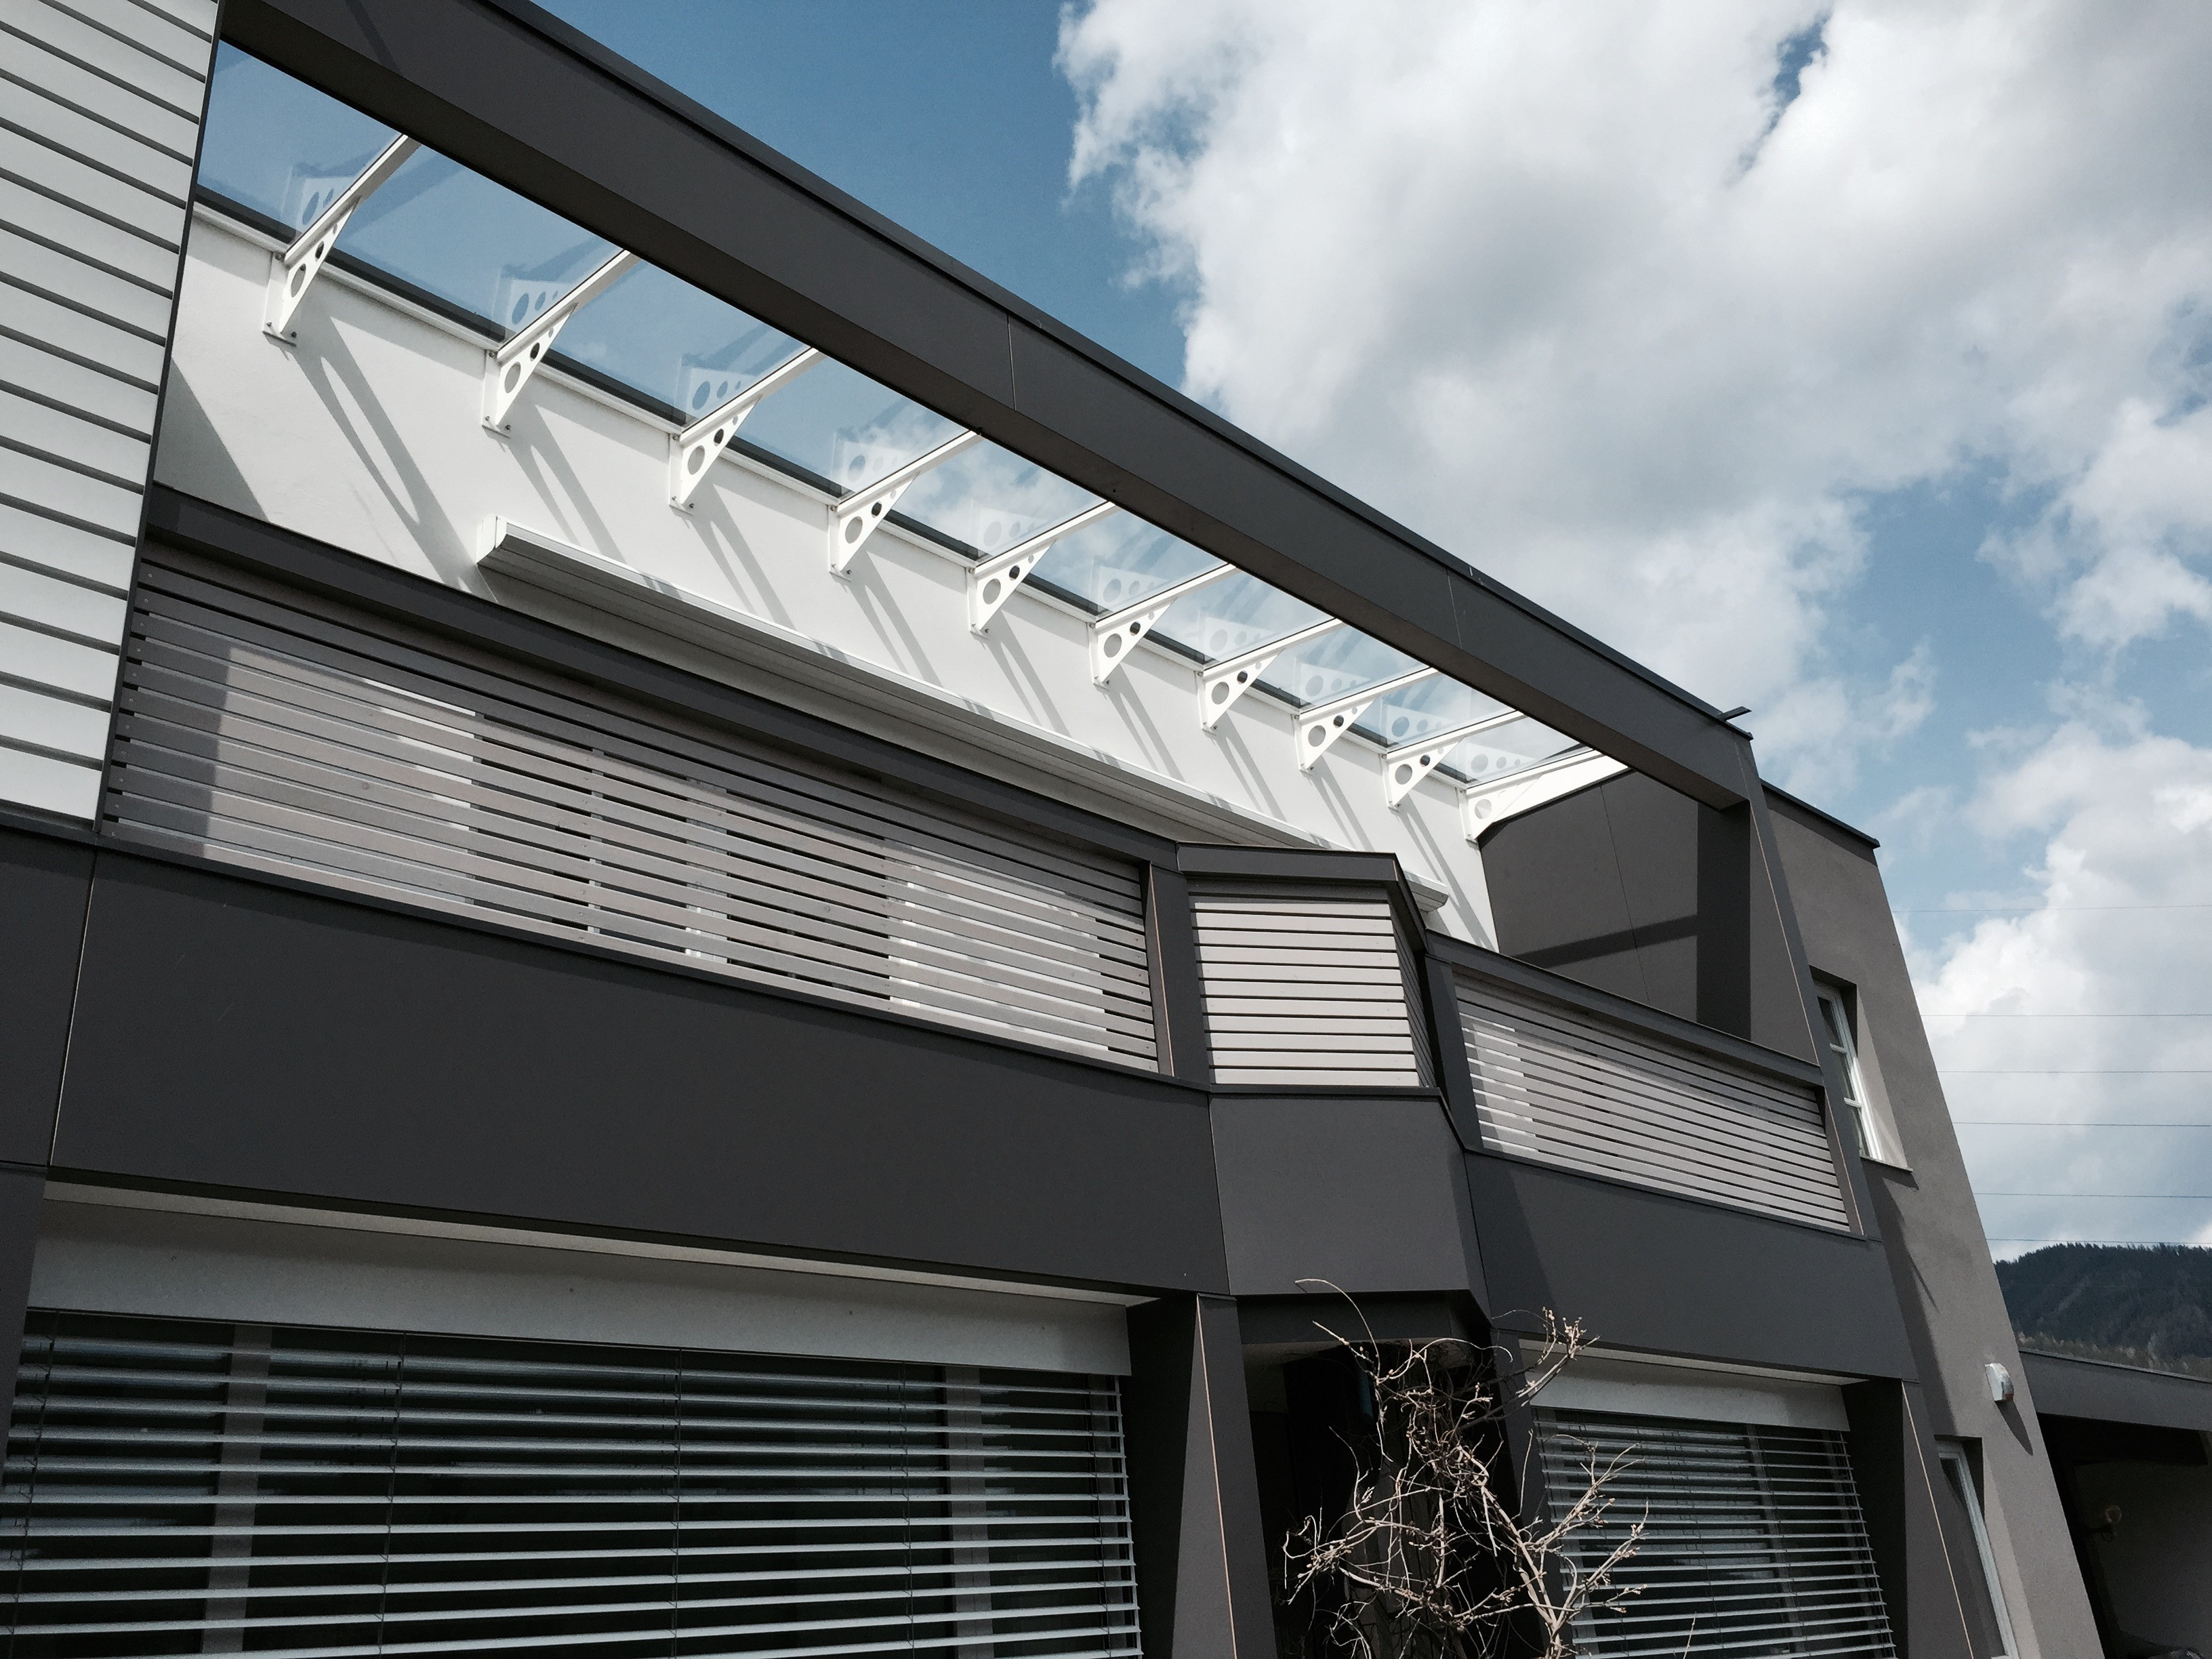 Metall überdachung glasverbau metall überdachung graz centrolux montage